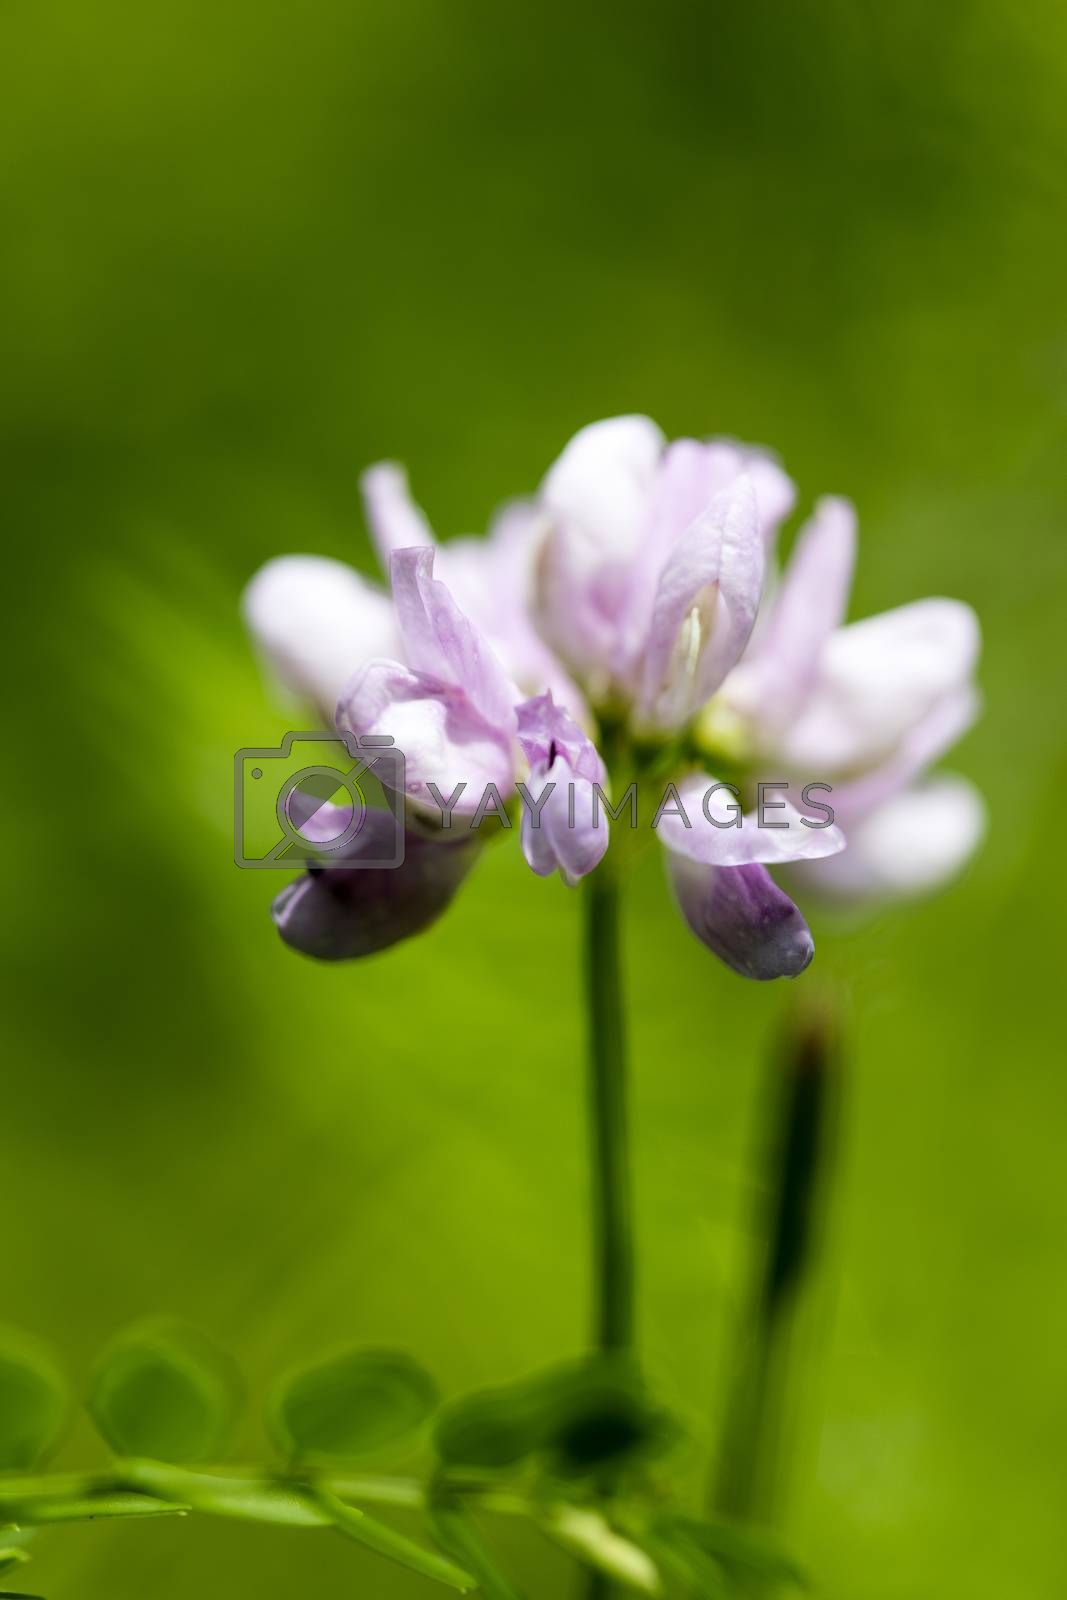 Wild flower trifolium botanical identity macro background fine art high quality prints products fifty megapixels